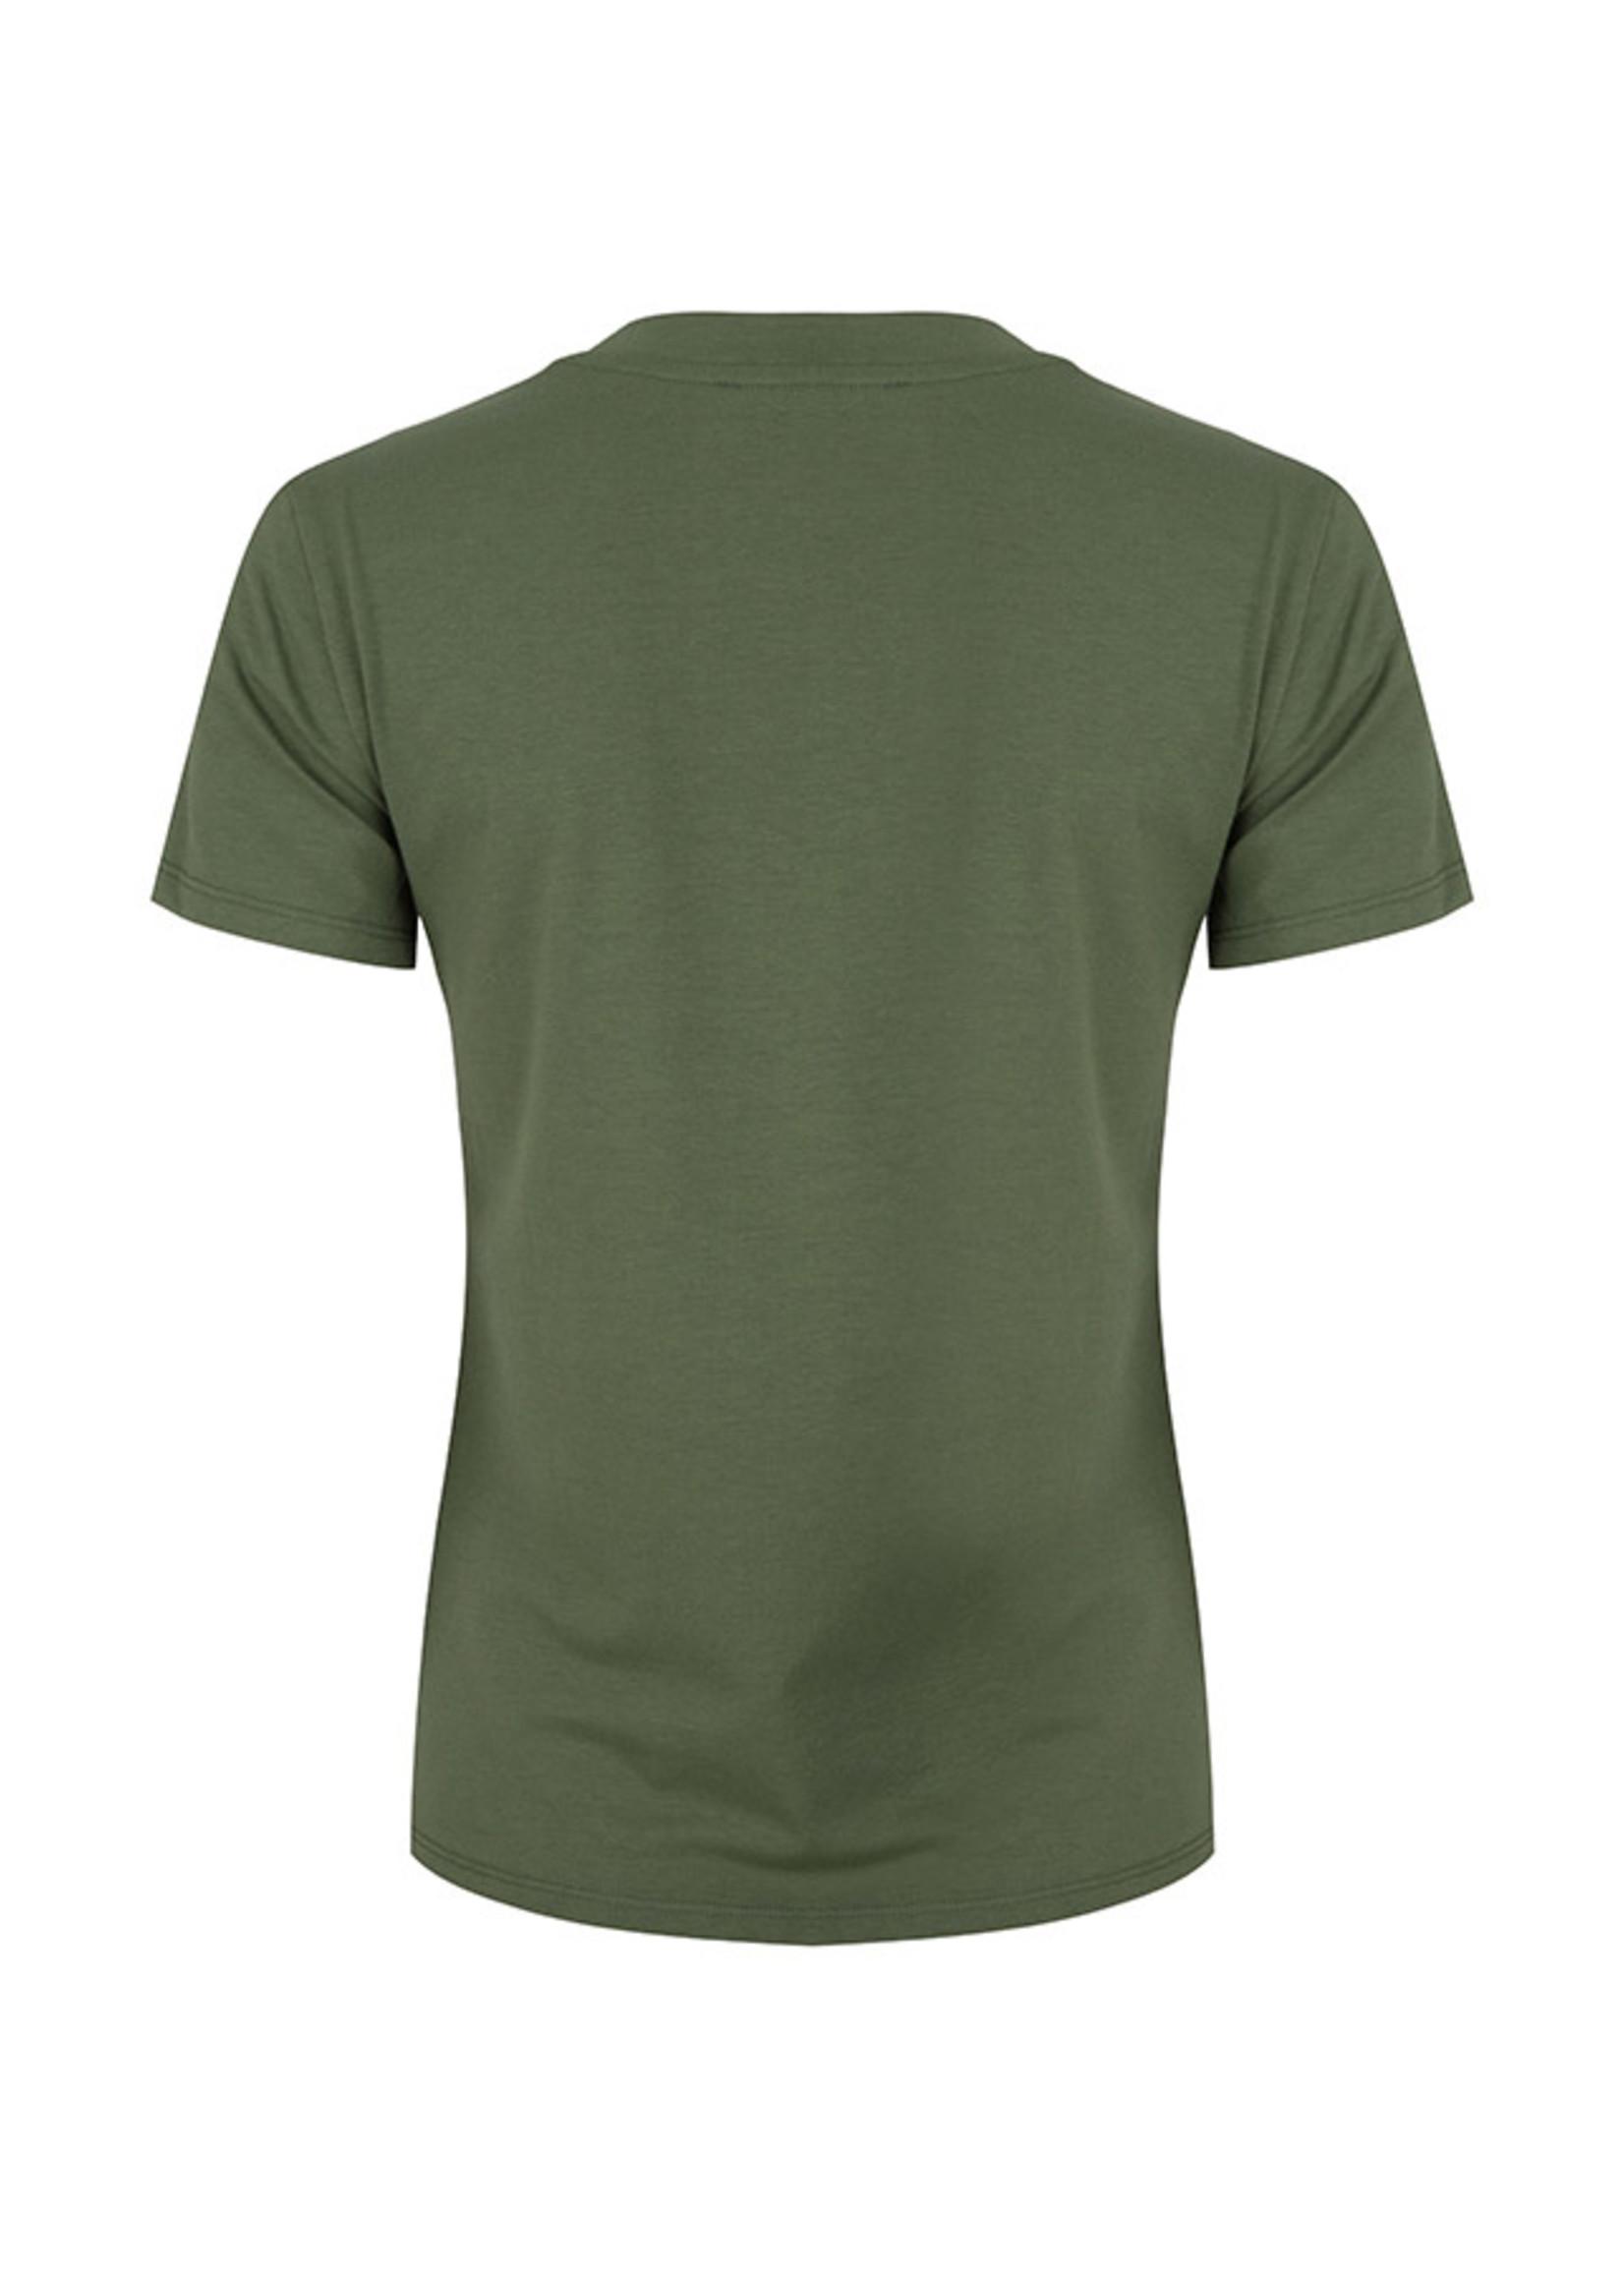 Lofty Manner Green shirt LOVELY